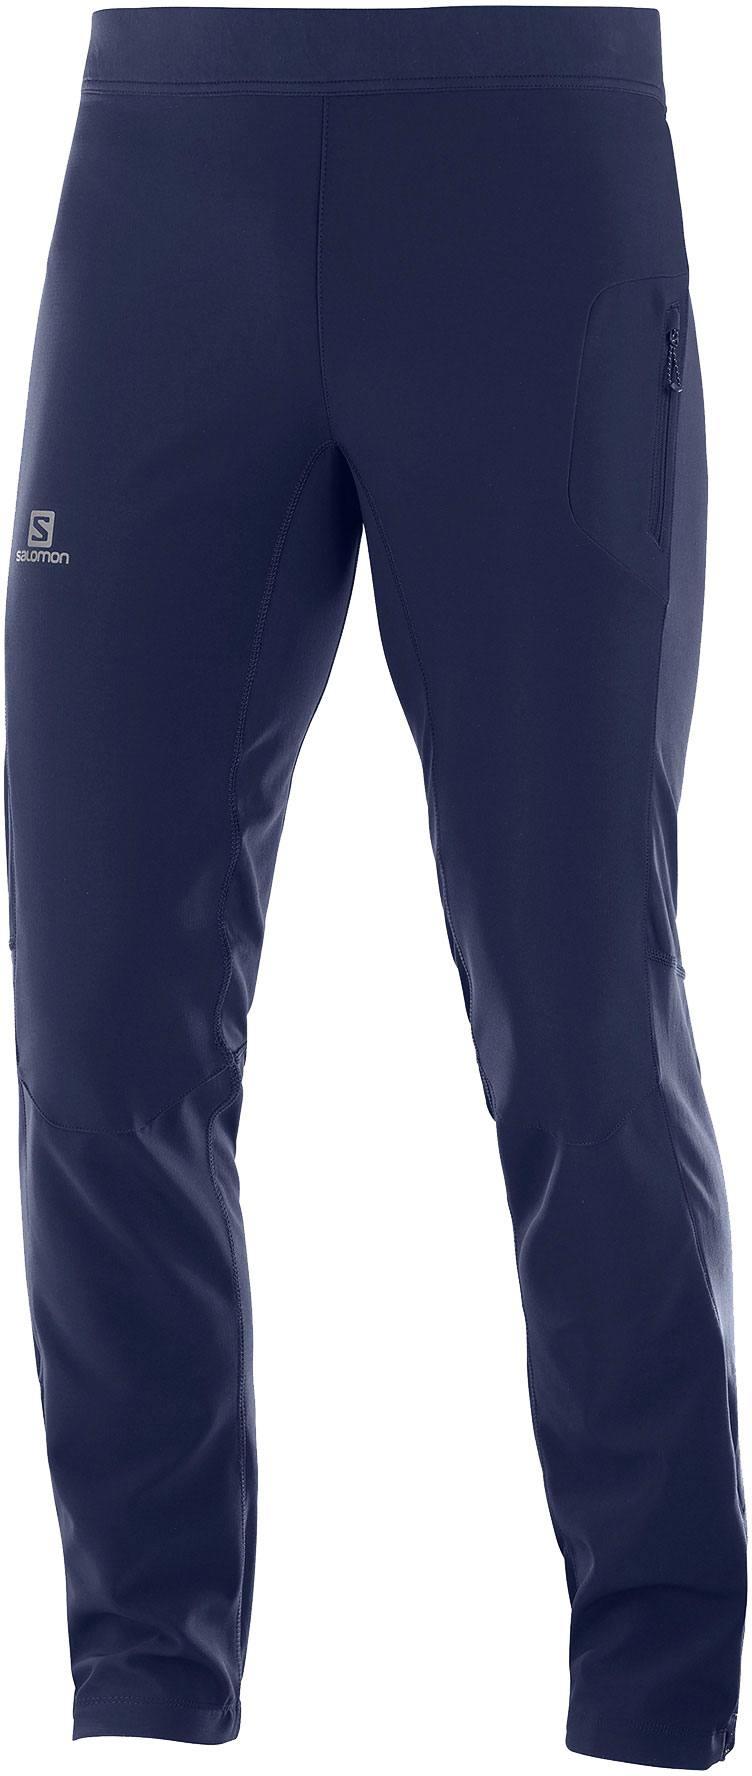 RS Warm Softshell Pant Night blue S